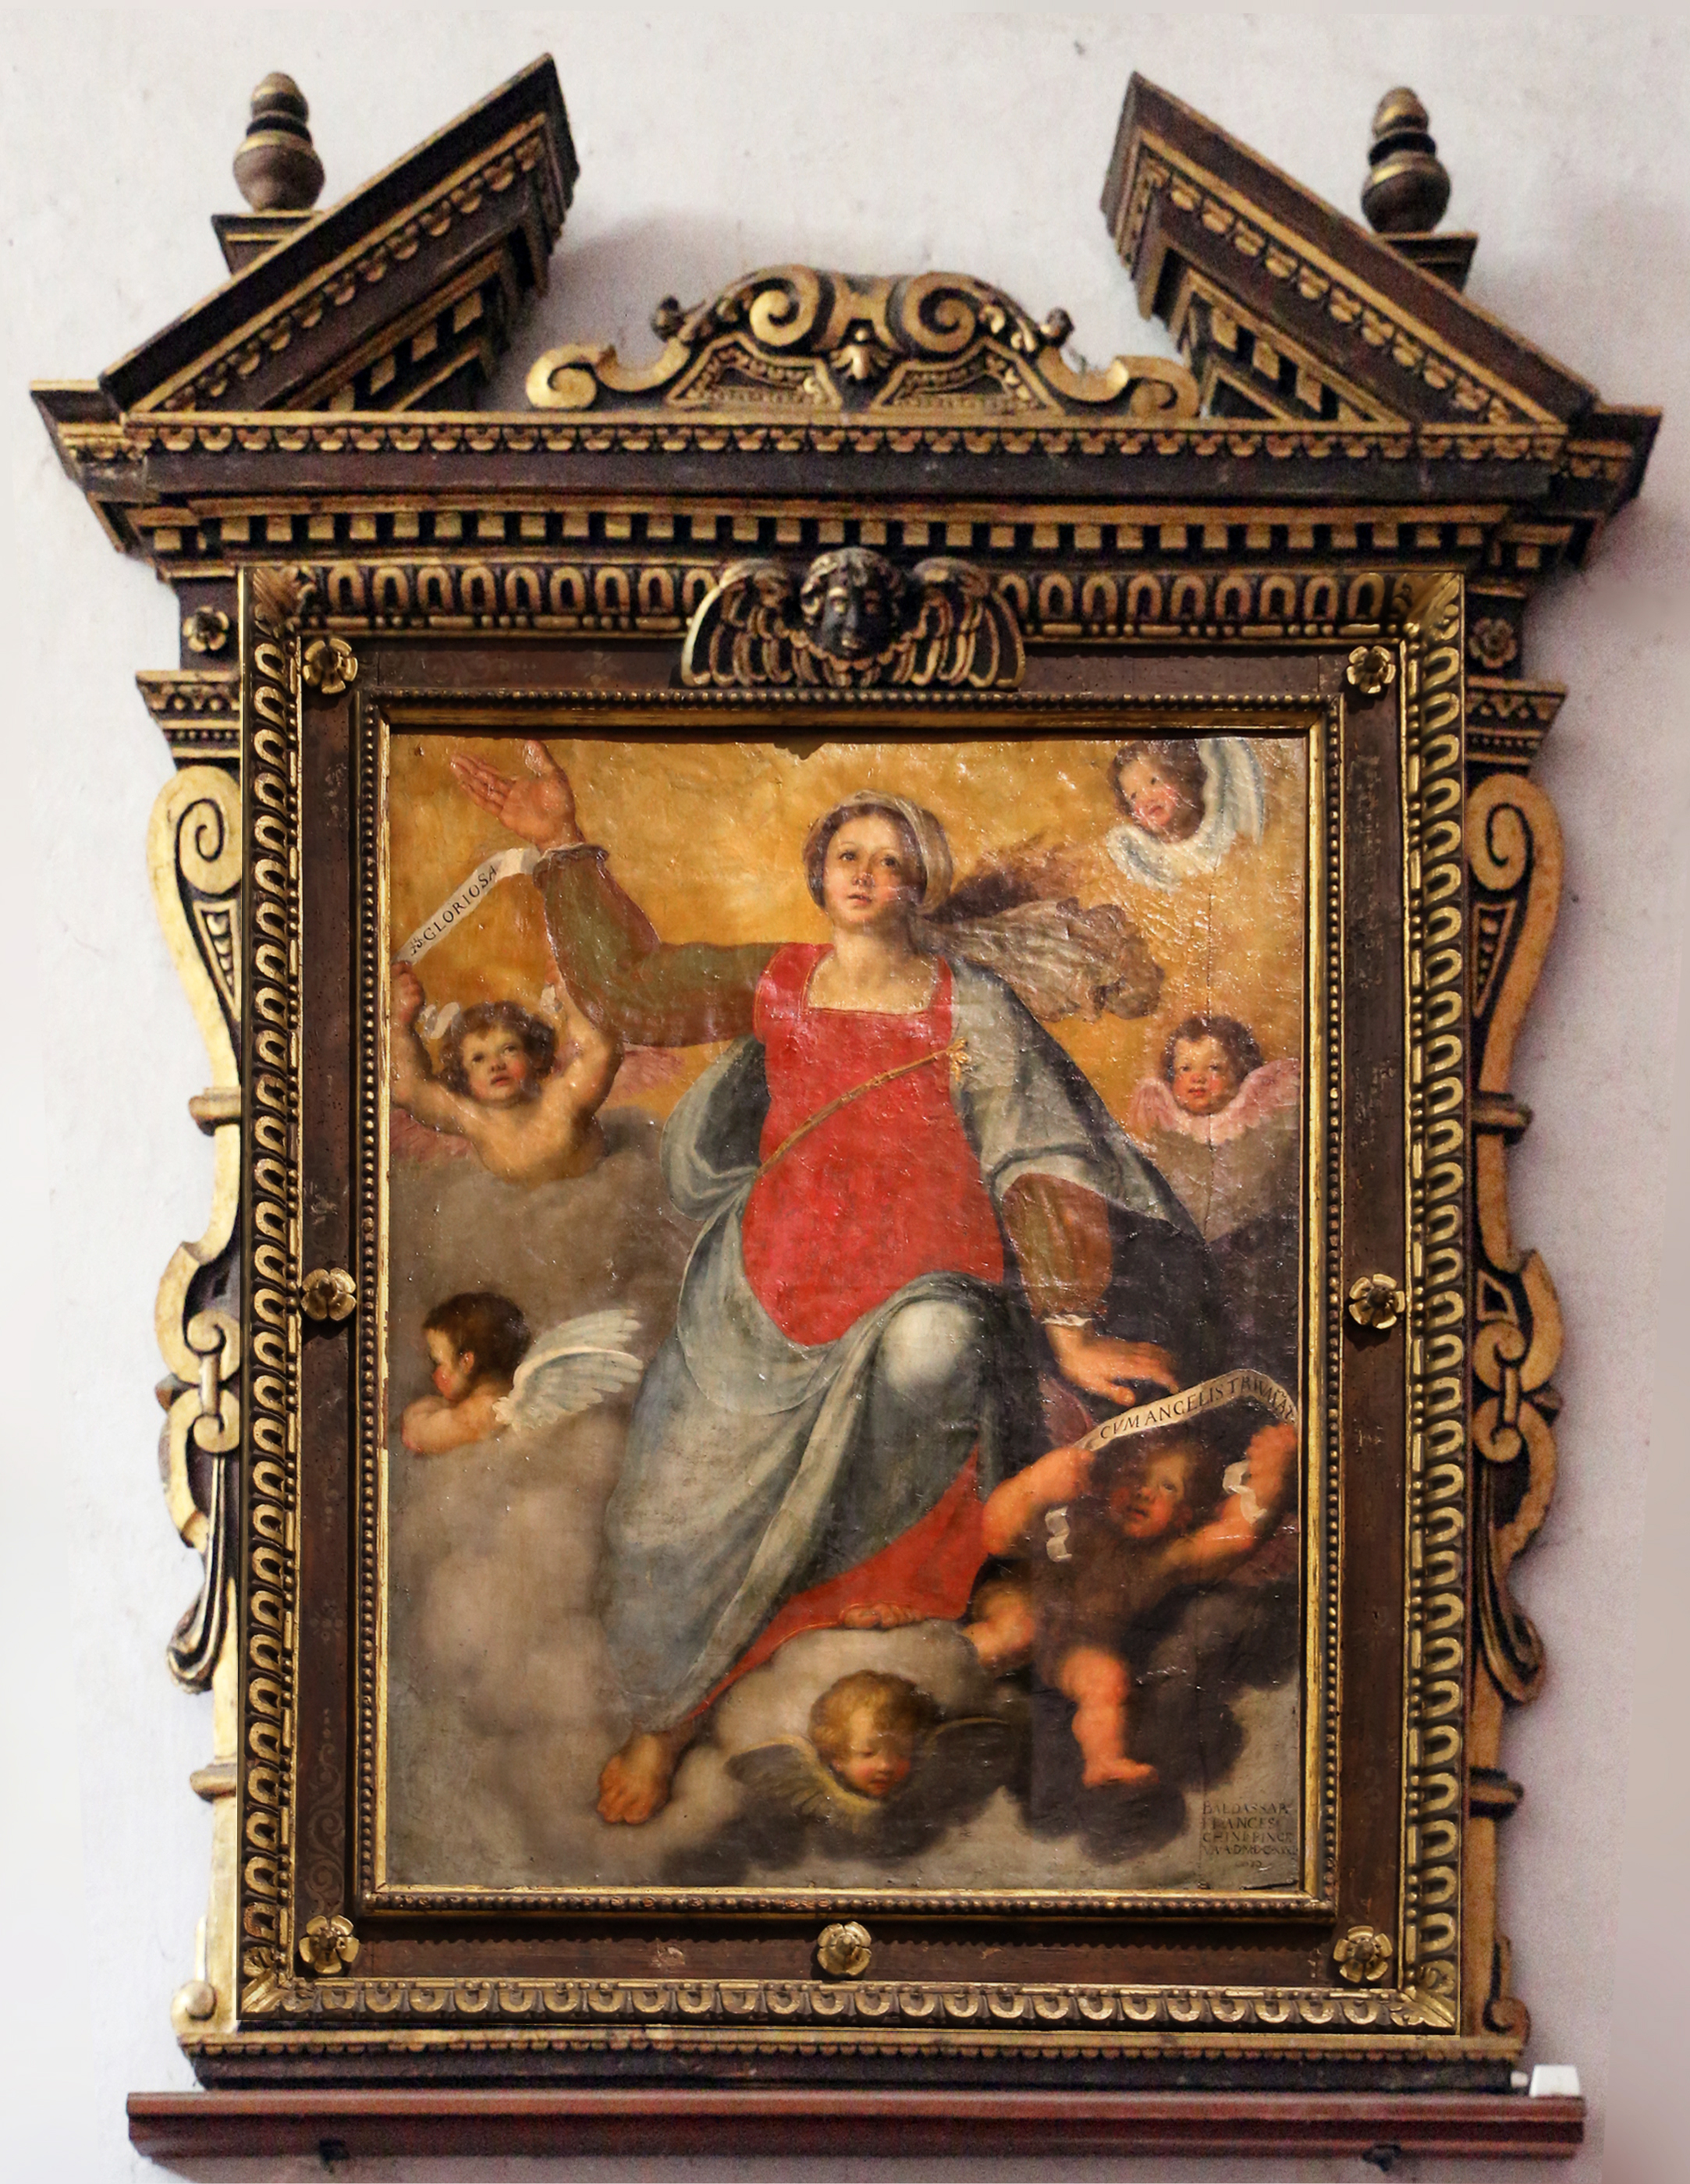 2 Il Volterrano Assumption of the Virgin 3